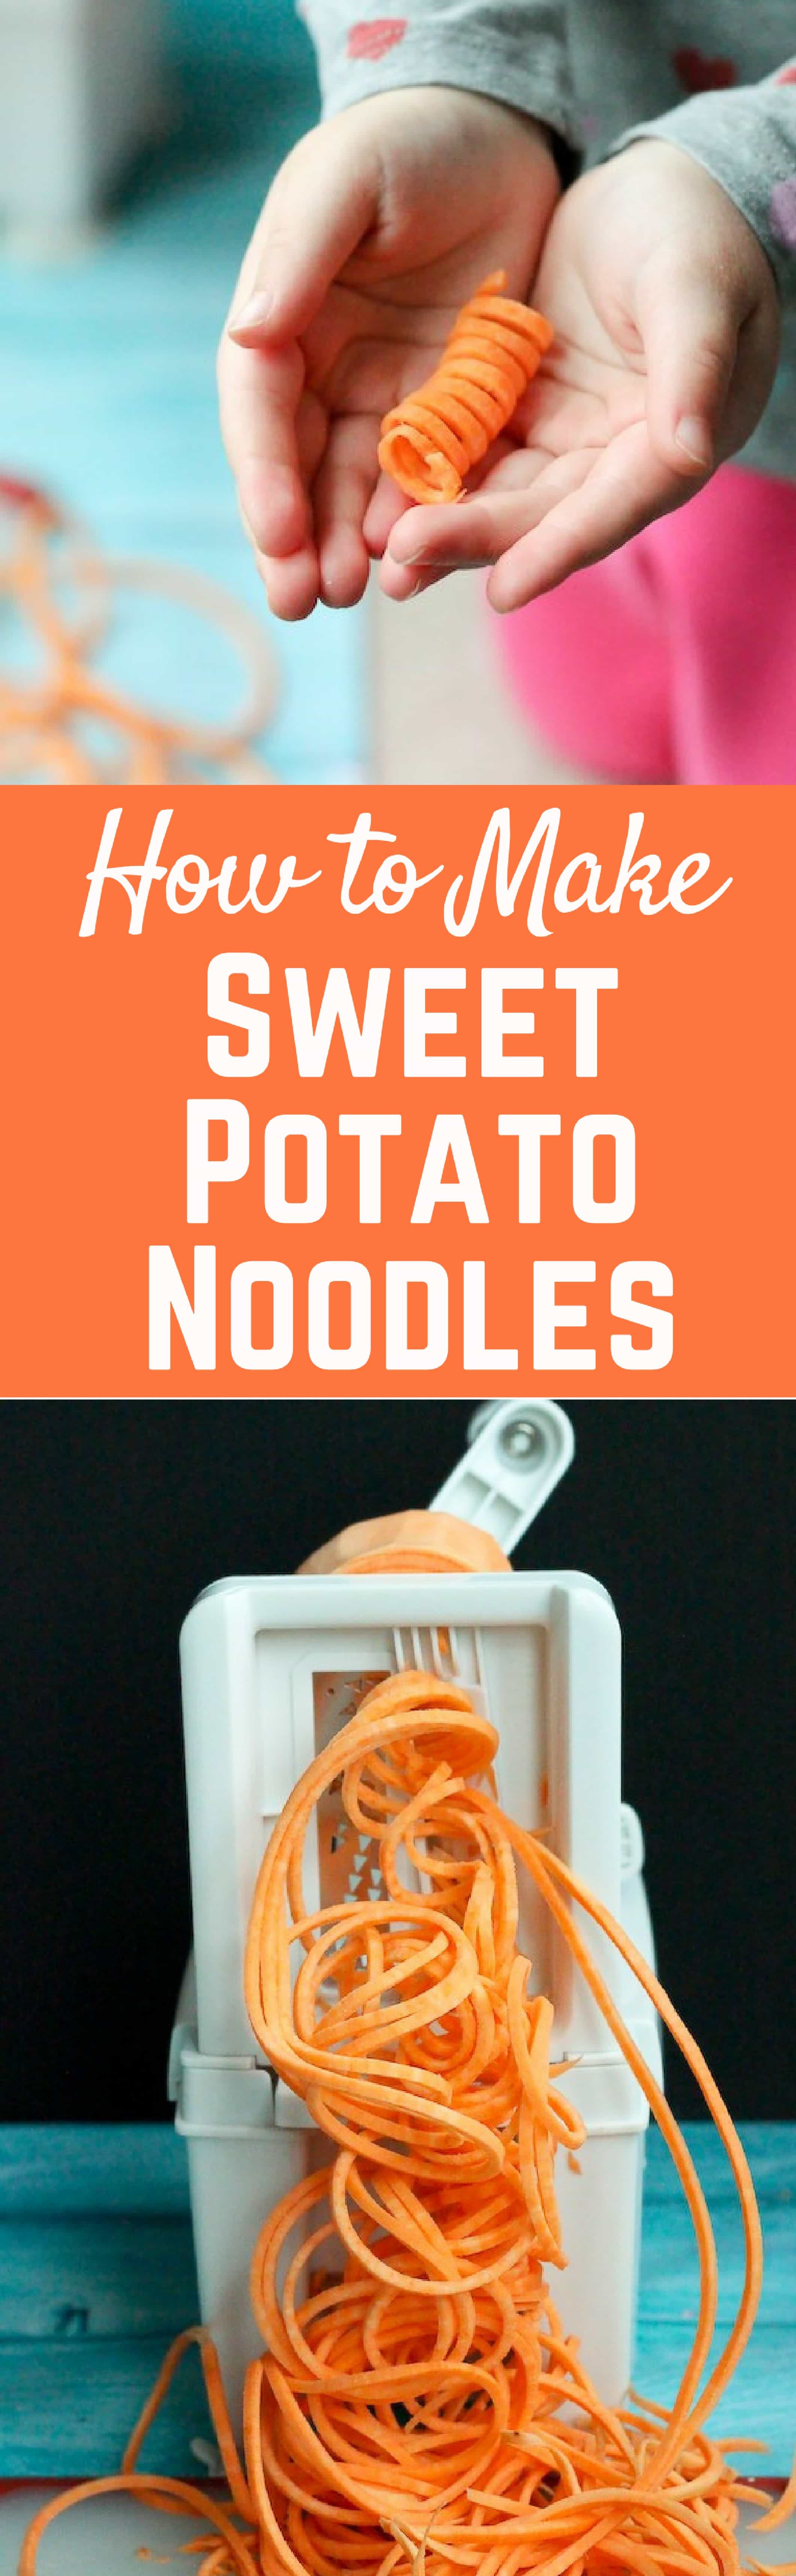 How To Cook A Sweet Potato  How to Make Sweet Potato Noodles Rachel Cooks